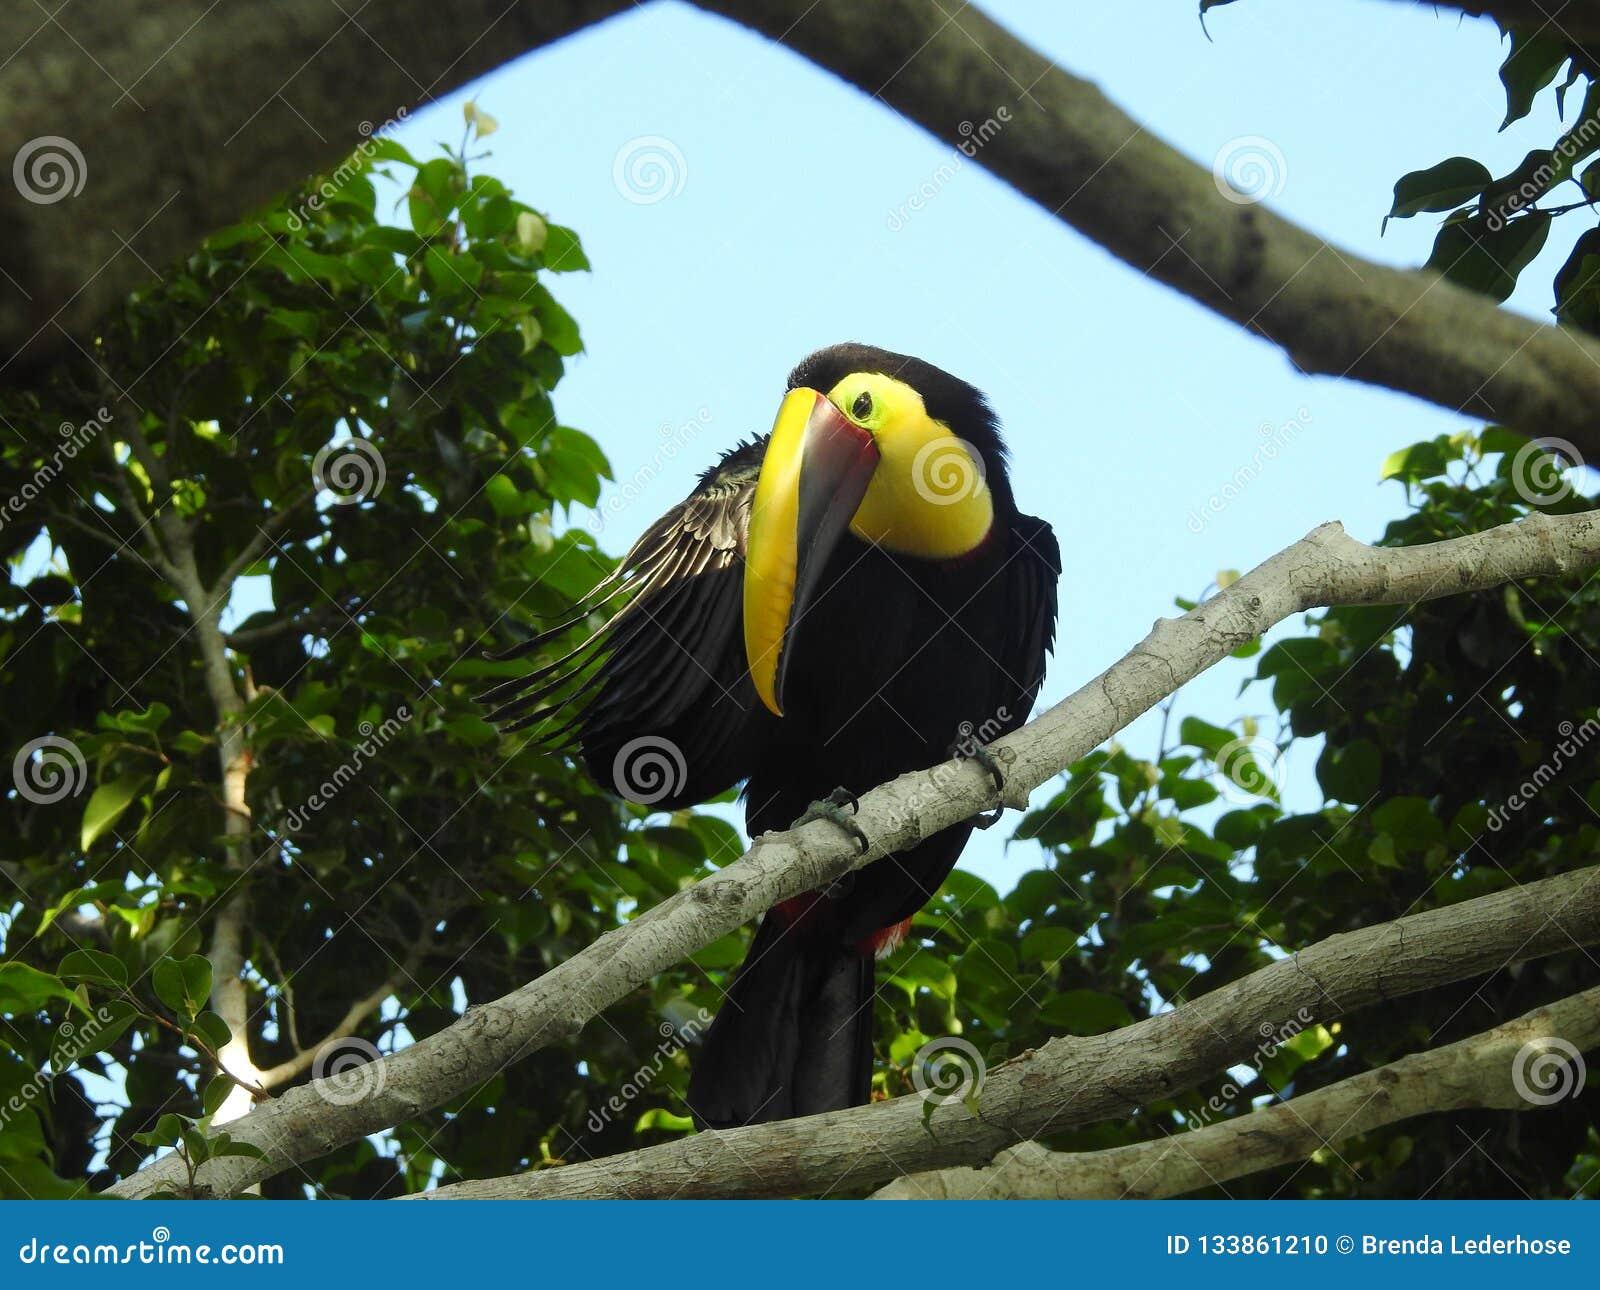 Toucan scratching an itch, Costa Rica